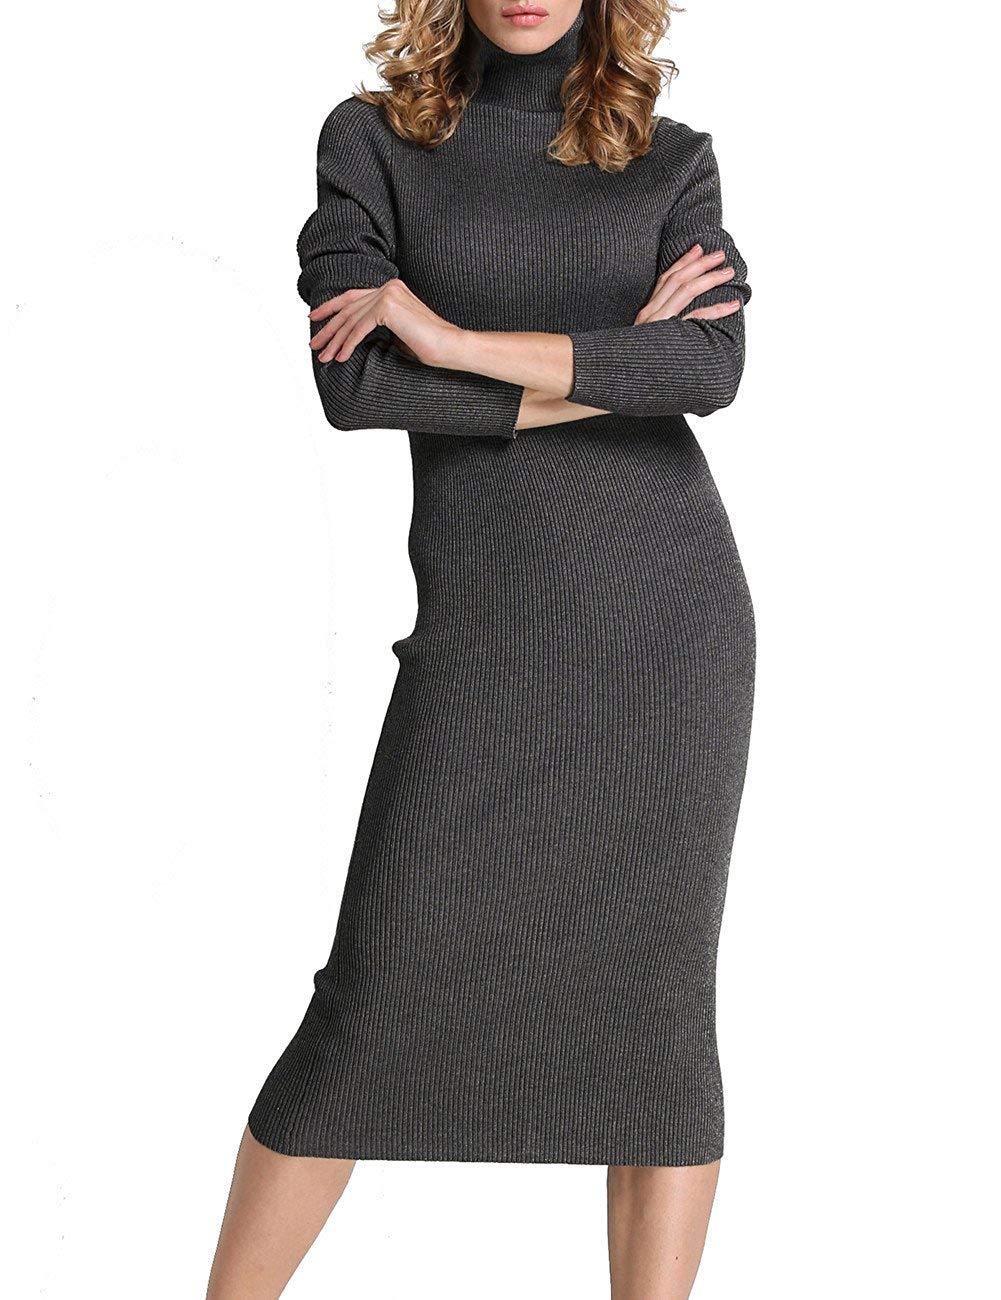 Rocorose Ribbed Knit Long Sleeve Dress